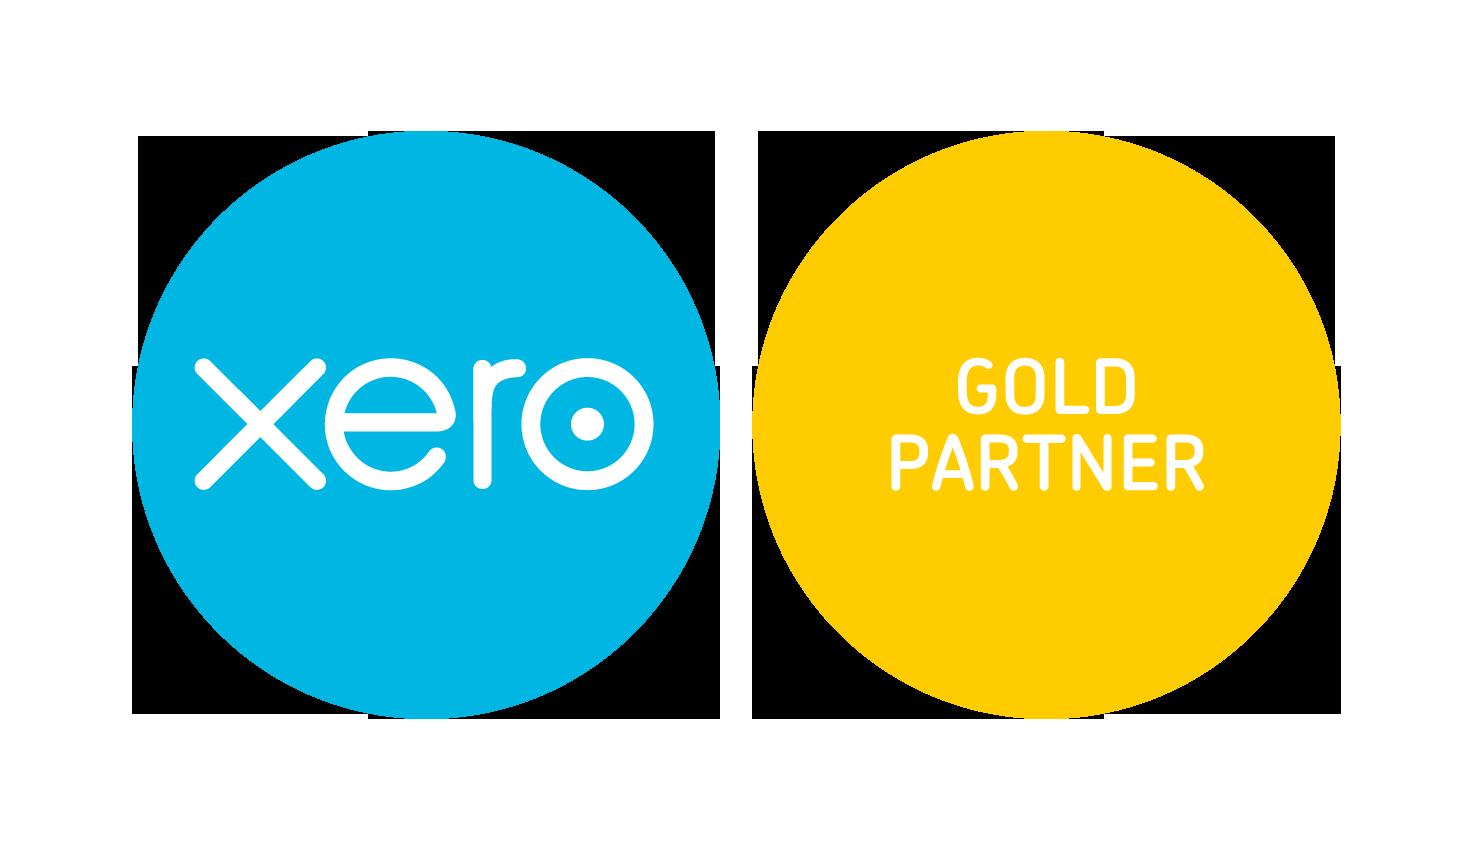 xero-gold-partner-logo-hires-RGB (3).png